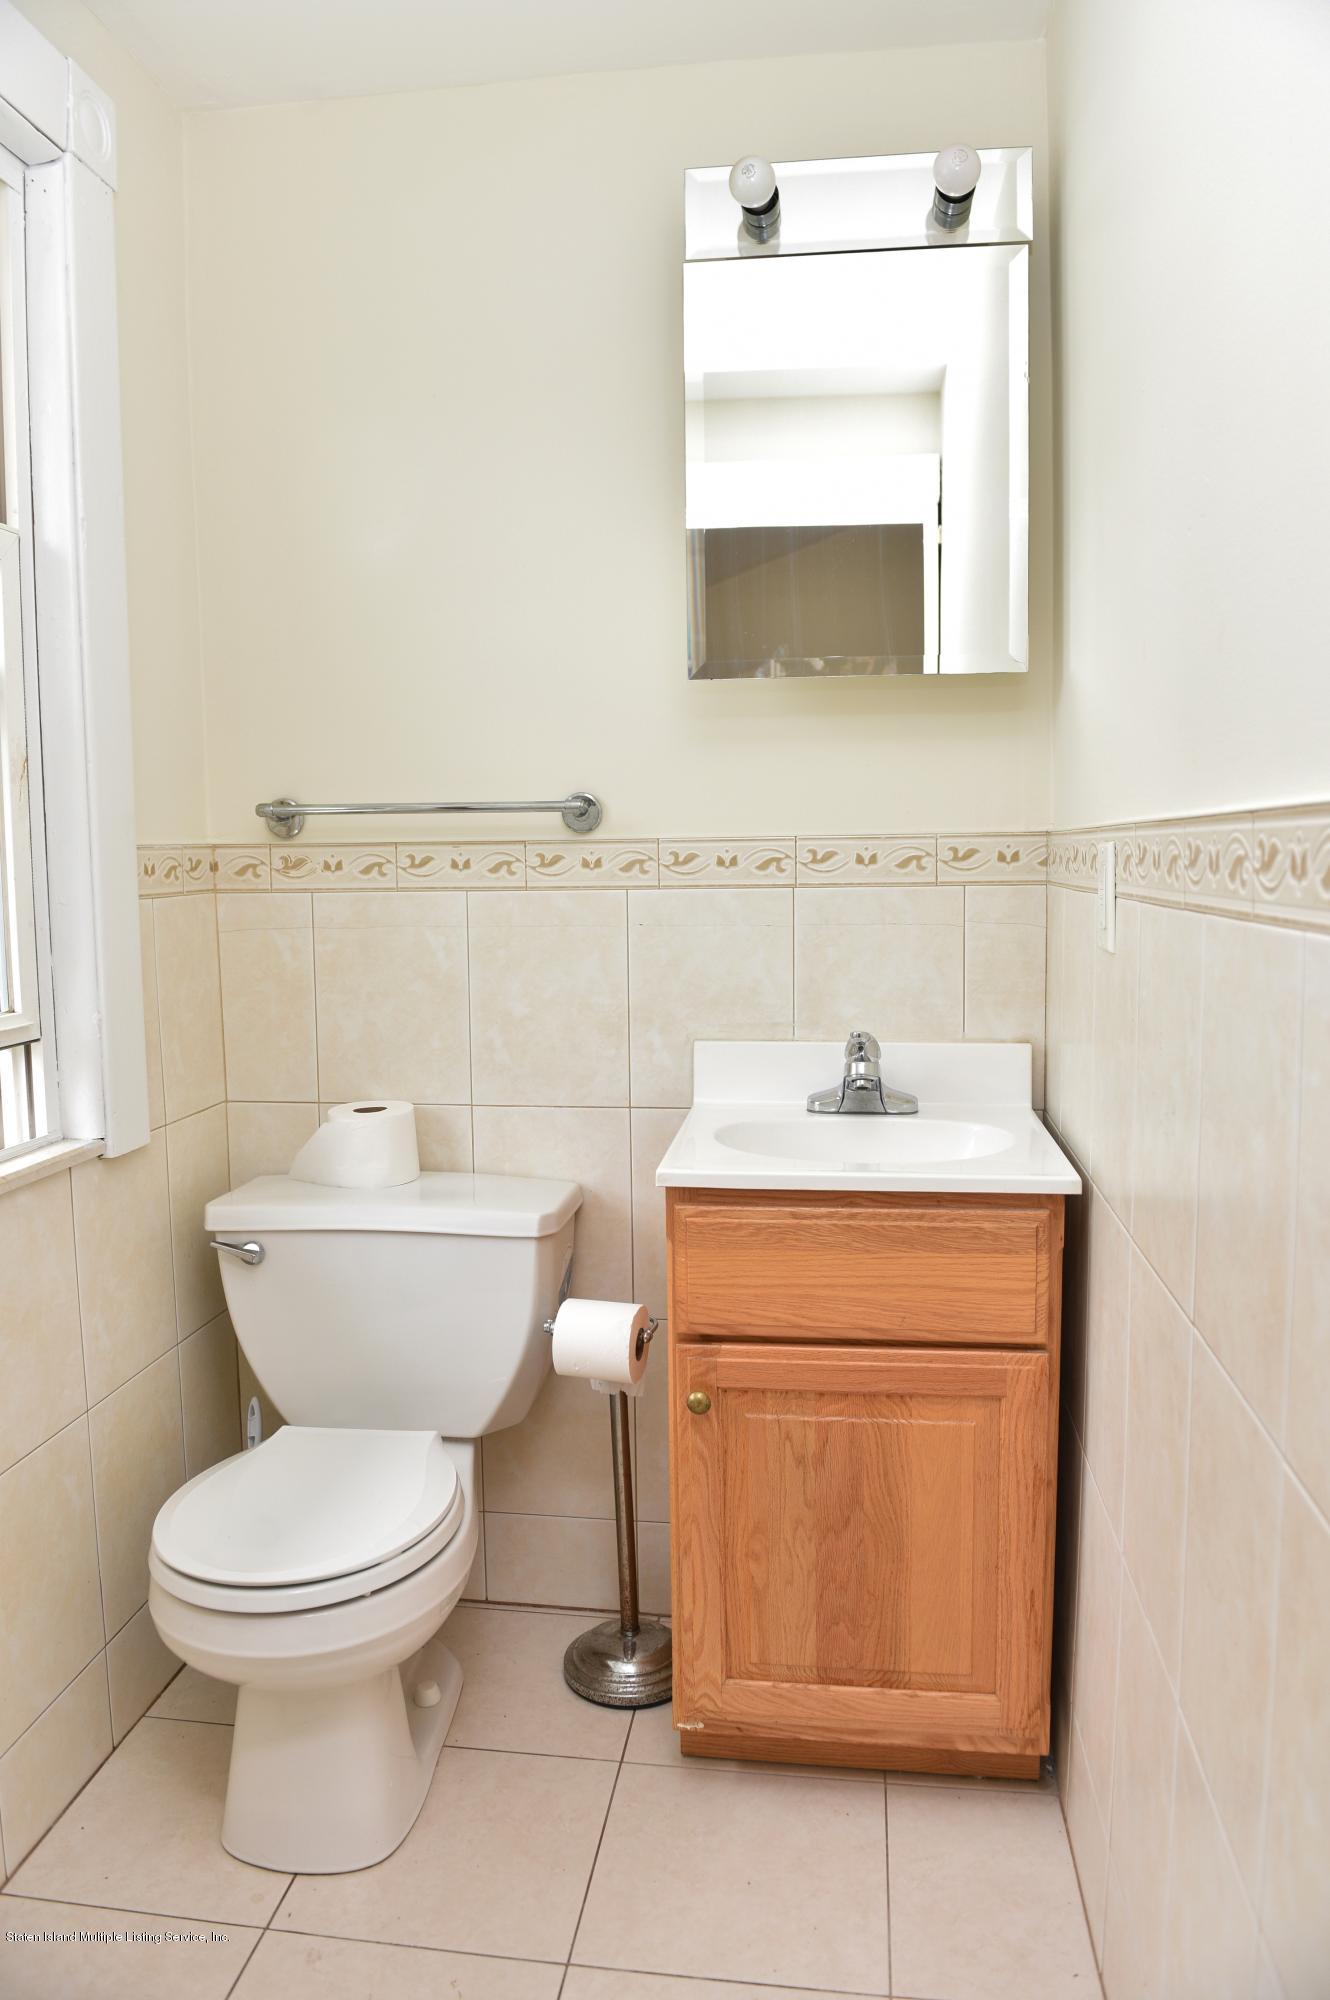 Single Family - Detached 257 Potter Avenue  Staten Island, NY 10314, MLS-1128622-29